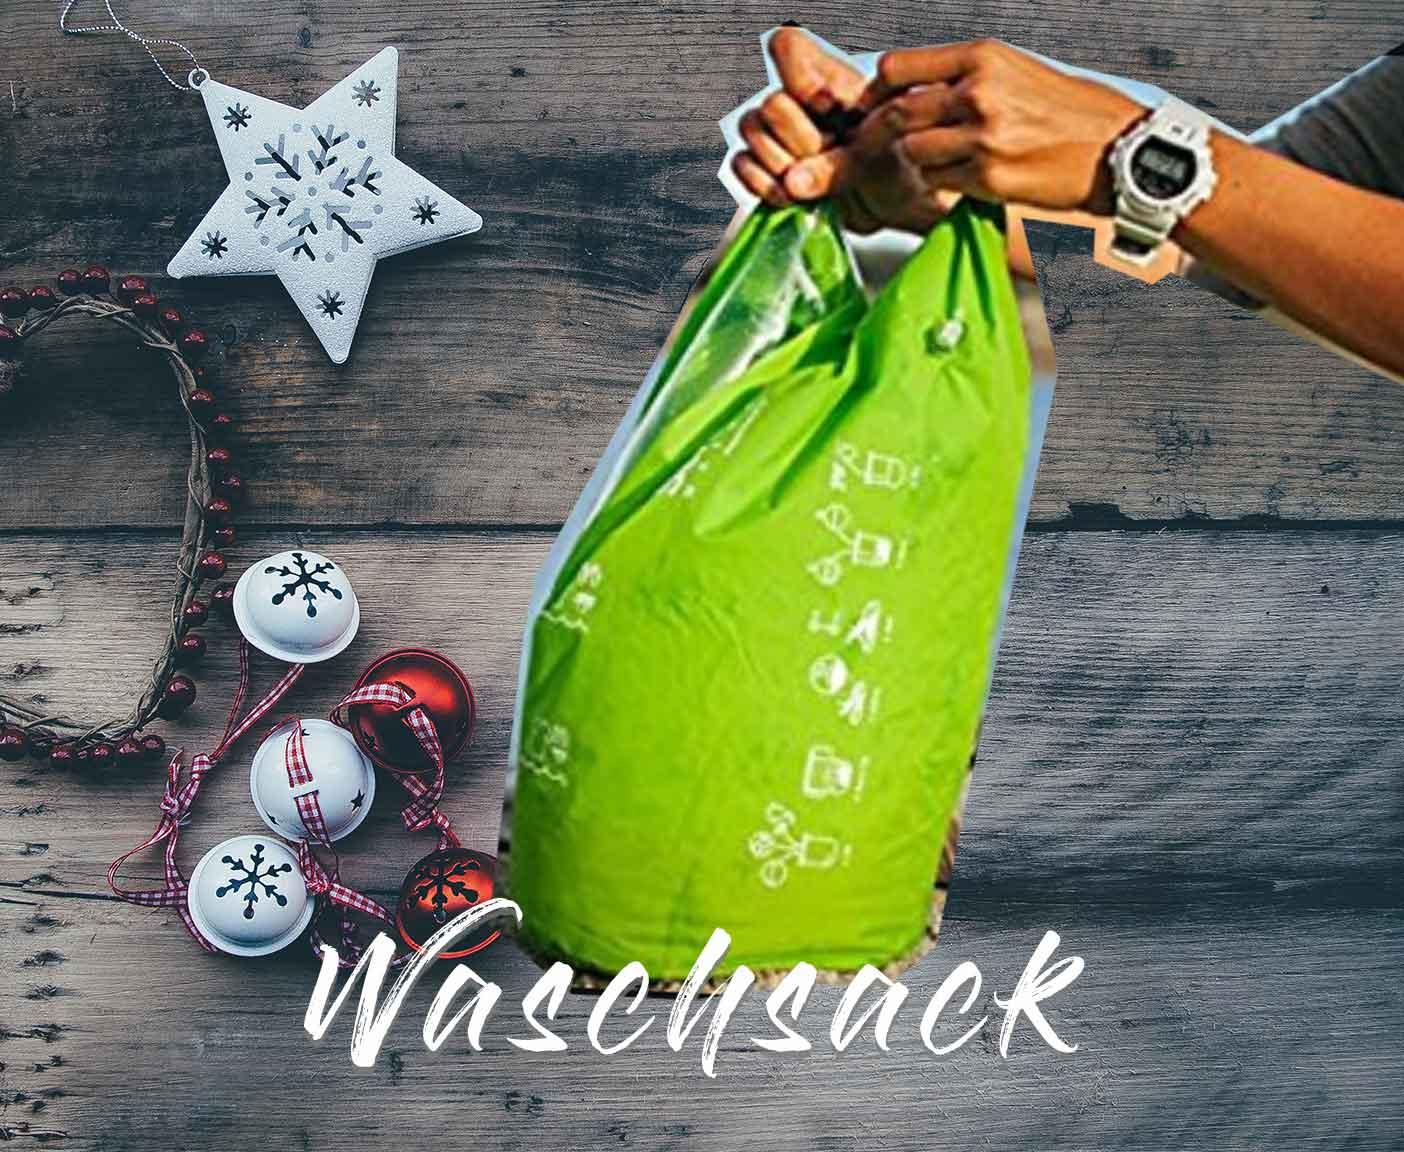 camper-geschenk-weihnachten-geschenkideen-wohnmobil-lustige-accessoires-geschenkkorb-camping-ideen-campen-geburtstag-camp-geschichten-vanlife-Waschsack_11